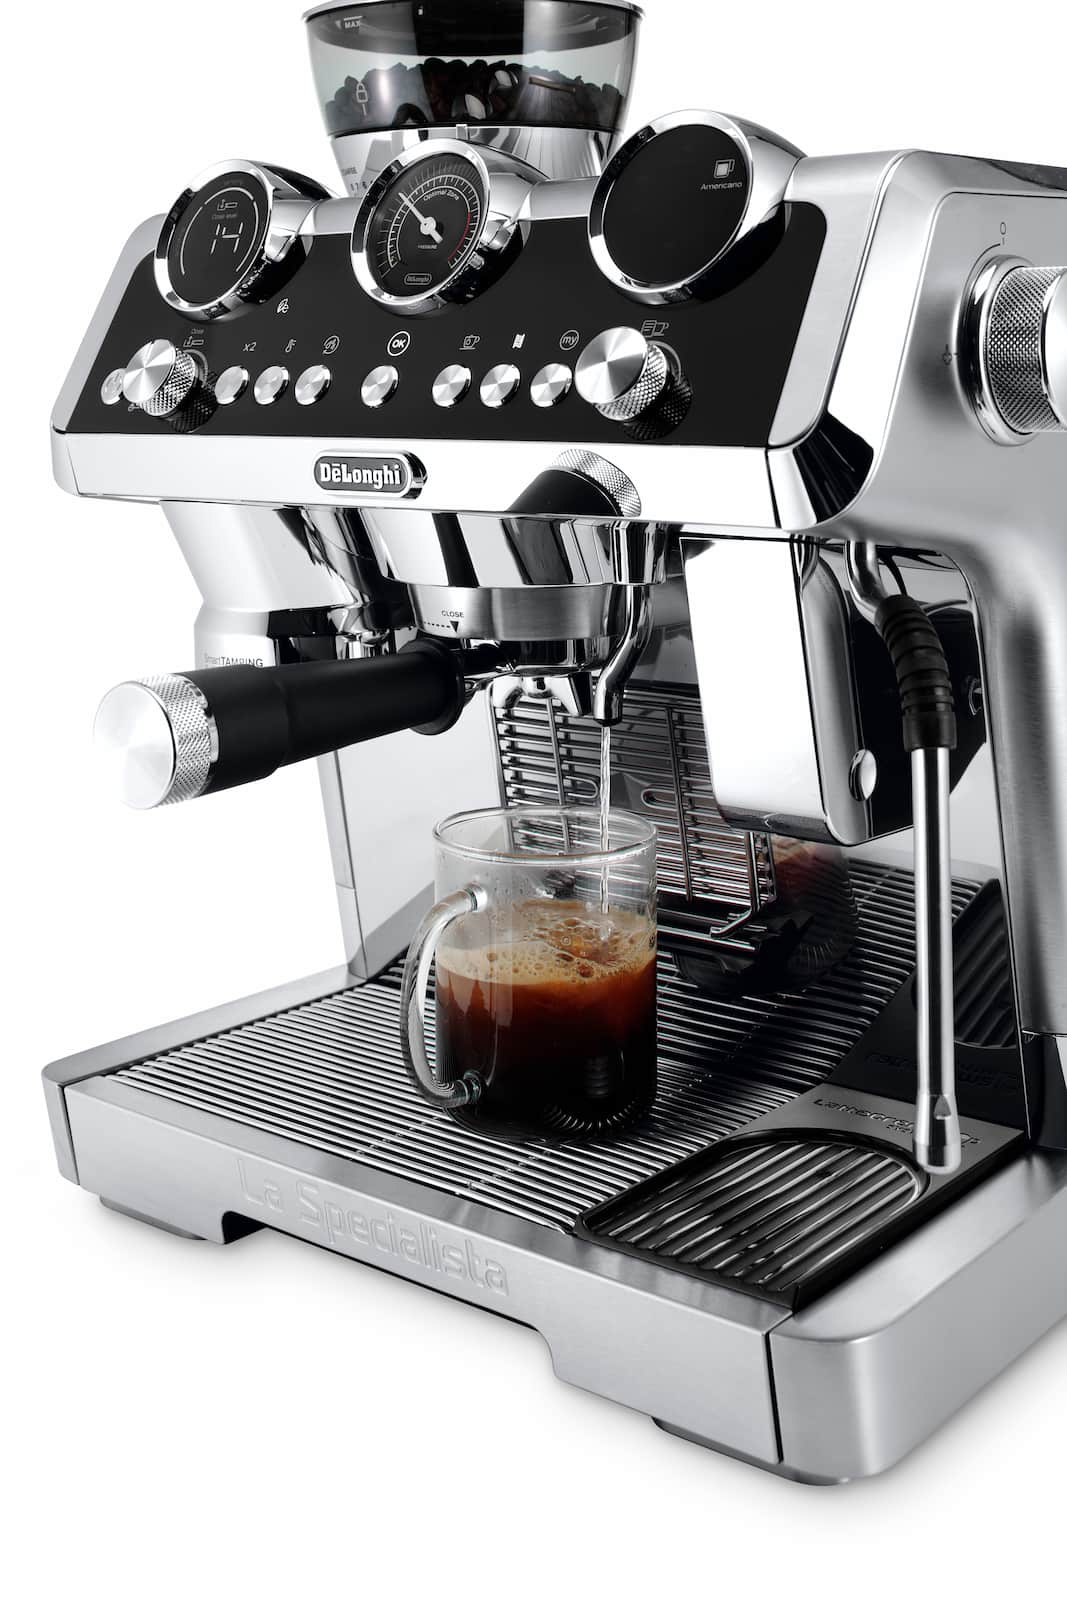 Kaffee in Perfektion trifft auf Design in Perfektion